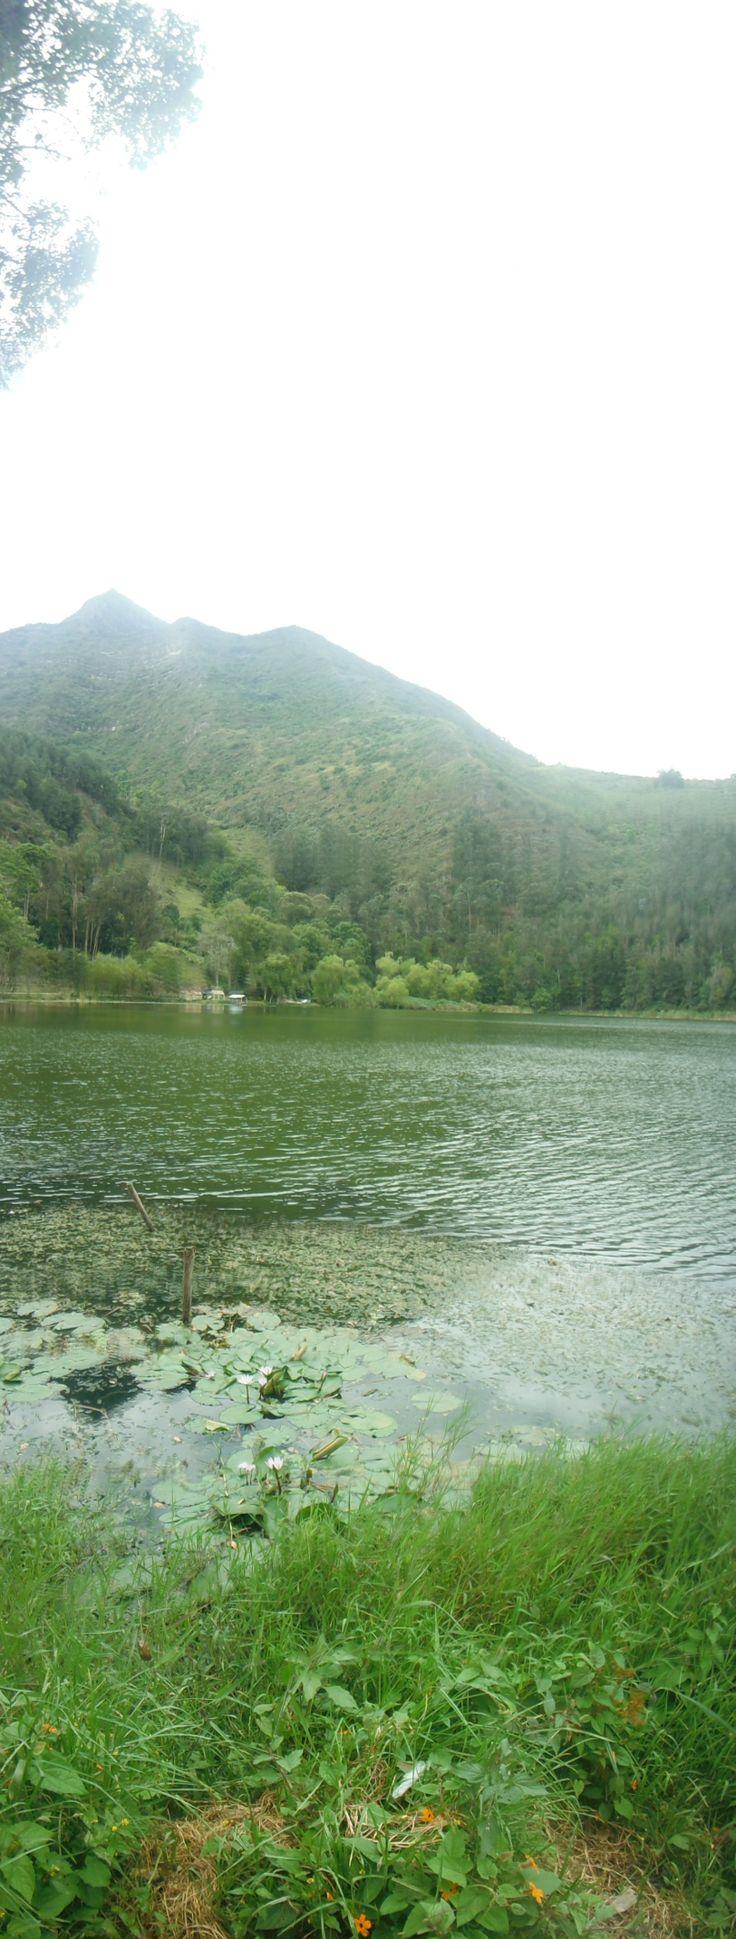 Laguna de #Ubaque #Cundinamarca #Colombia